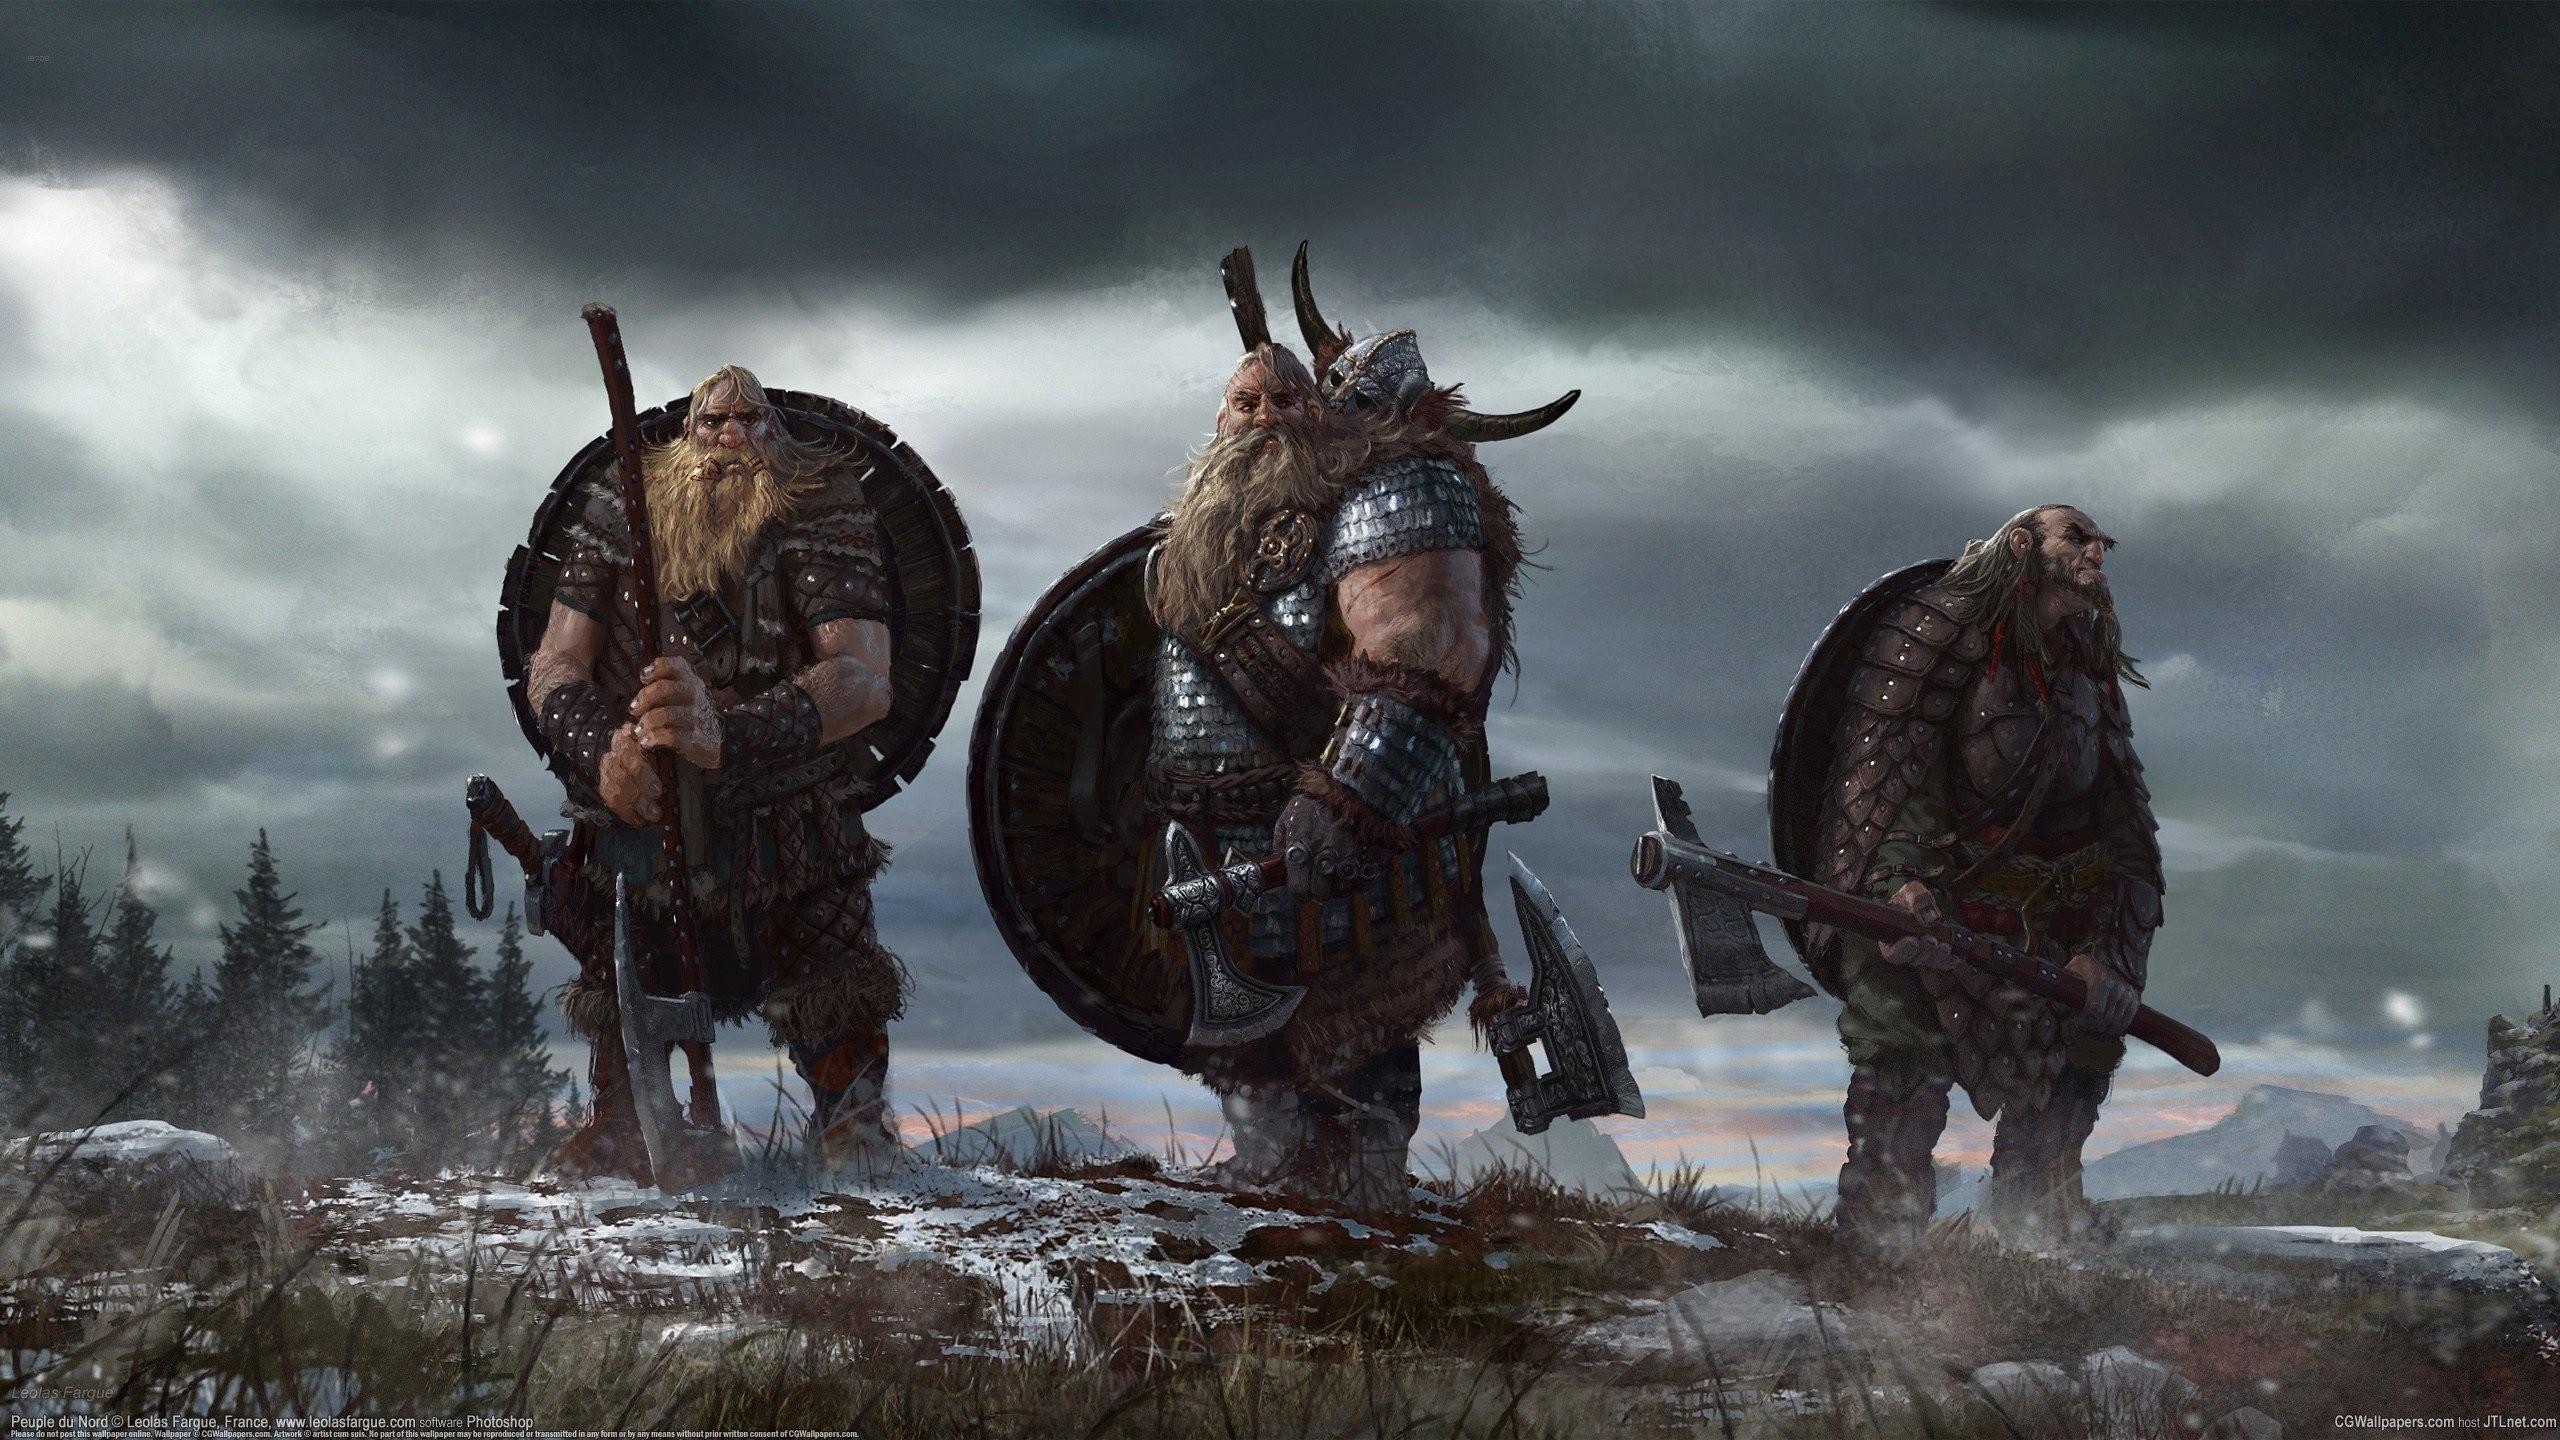 Fantasy Art Artwork Vikings Concept Warrior Axe Nordic Shield Axes Mythology Viking Screenshot Fictional Character